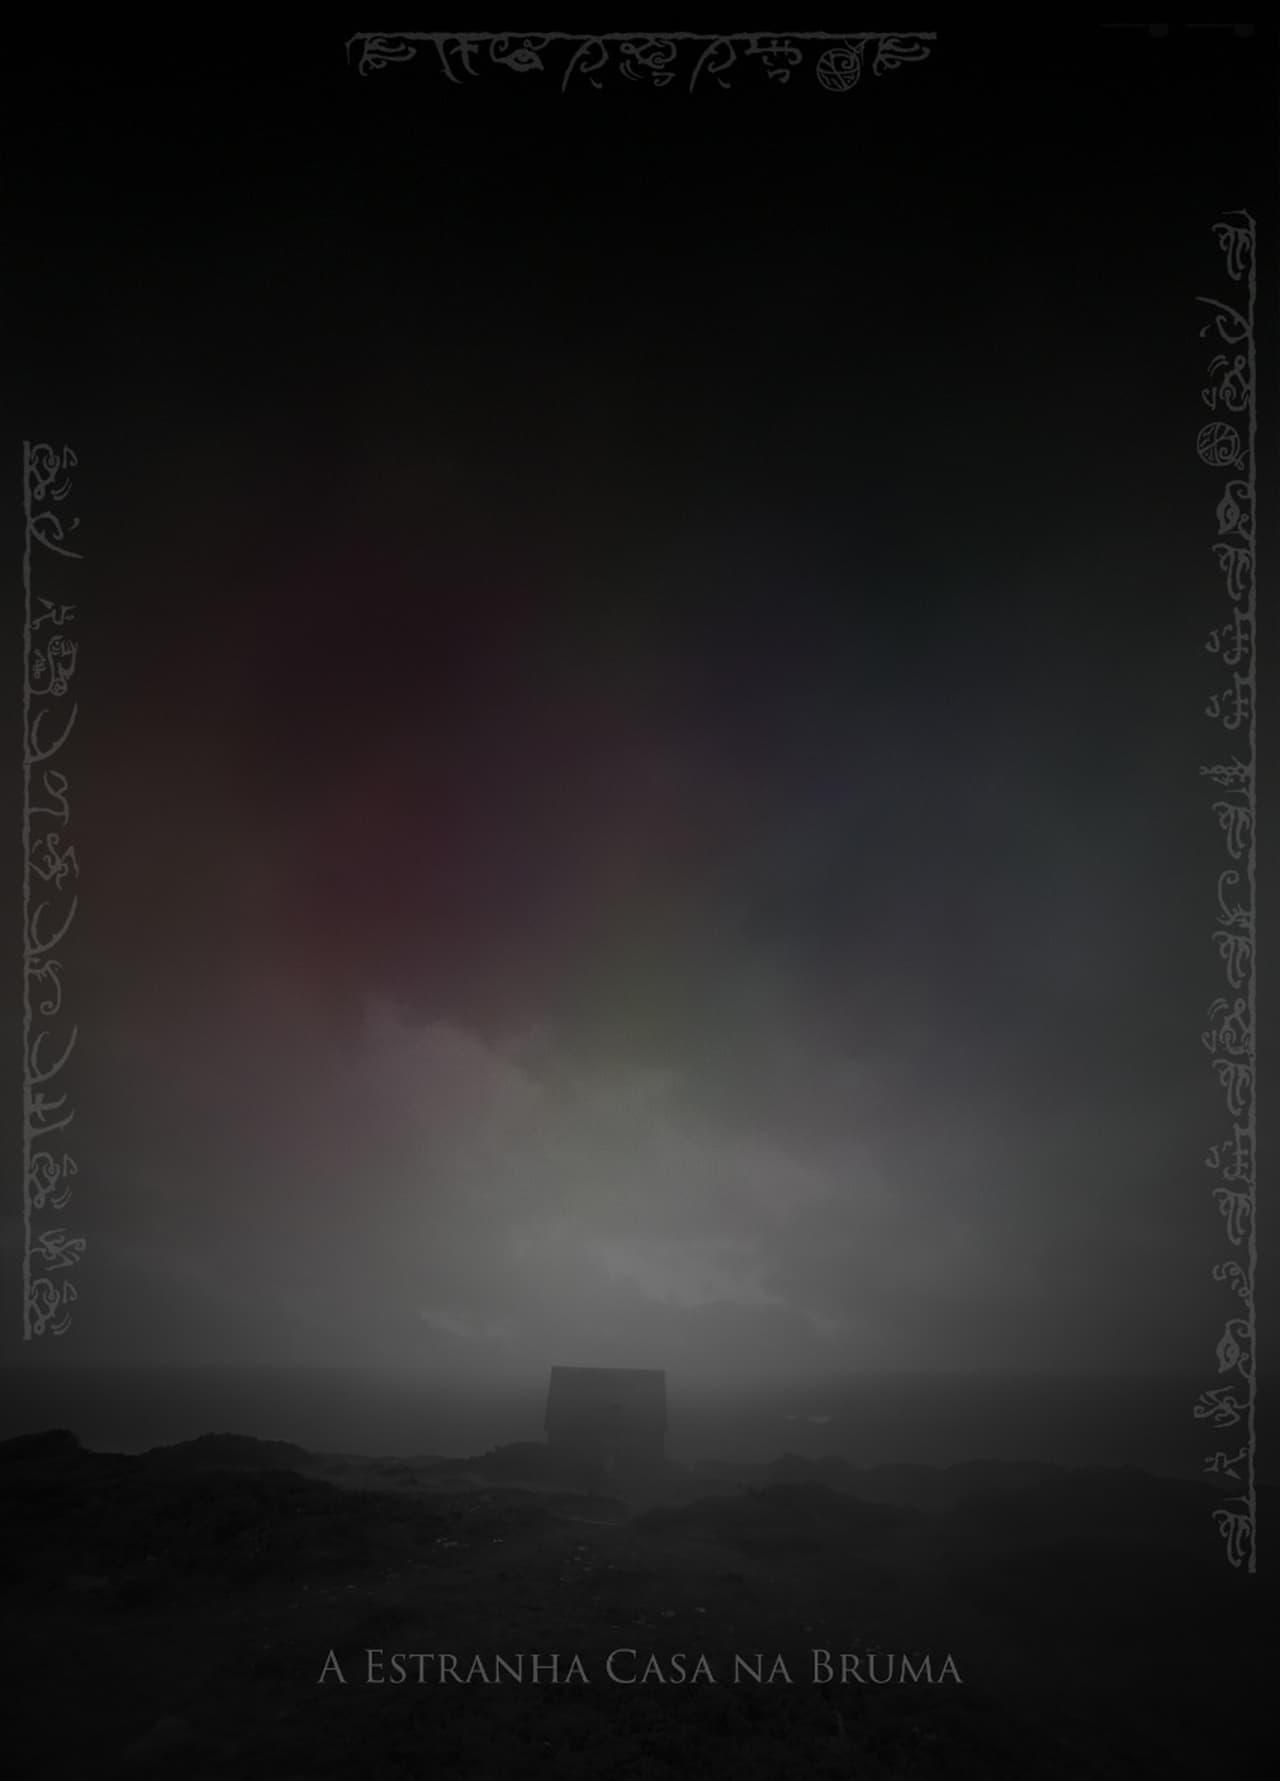 The Strange House in the Mist